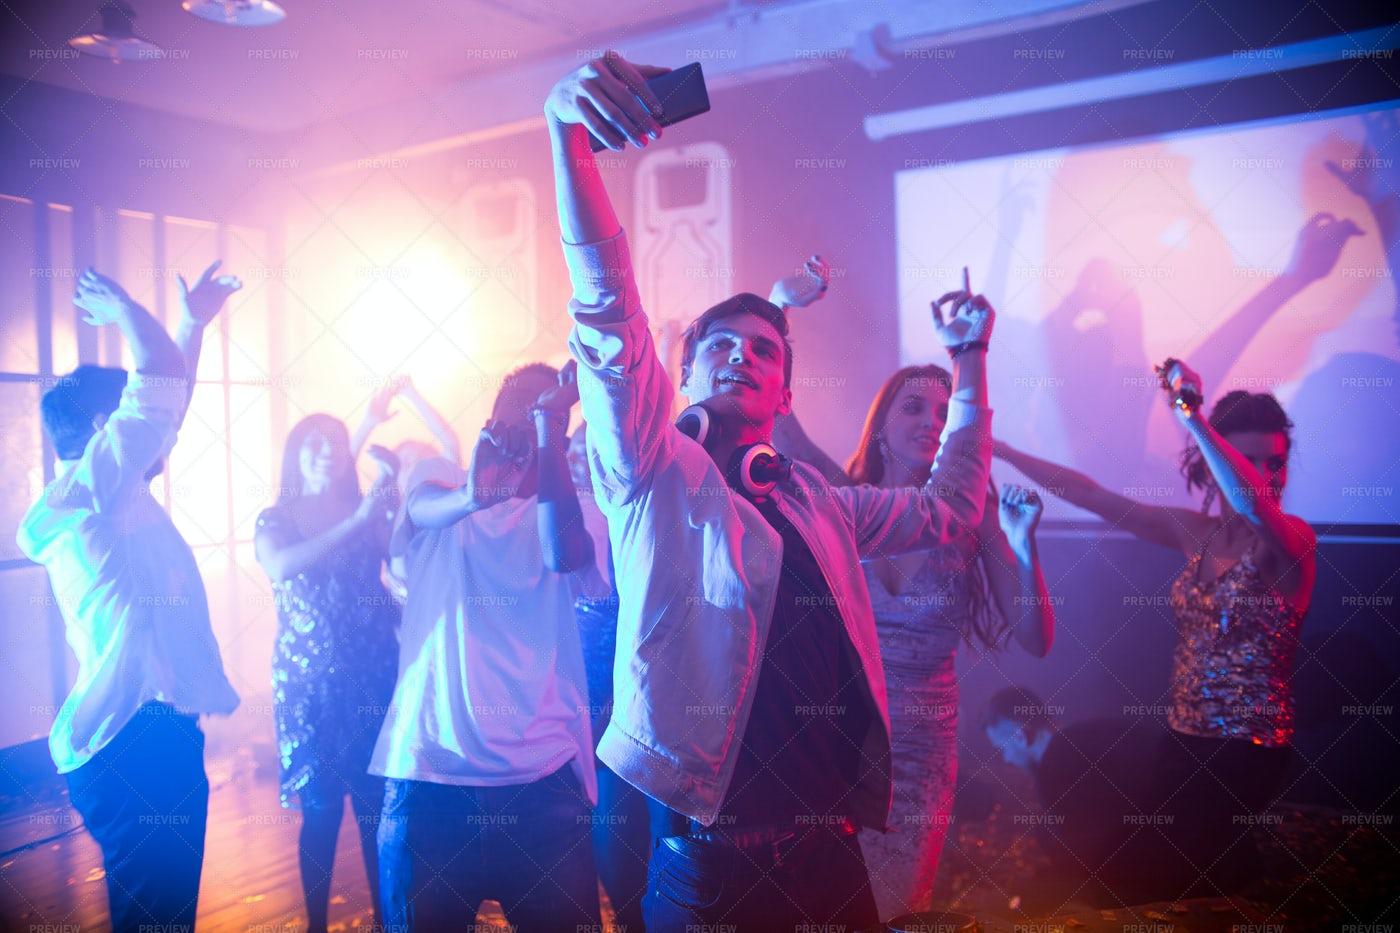 Teenager Taking Selfie On Dance...: Stock Photos